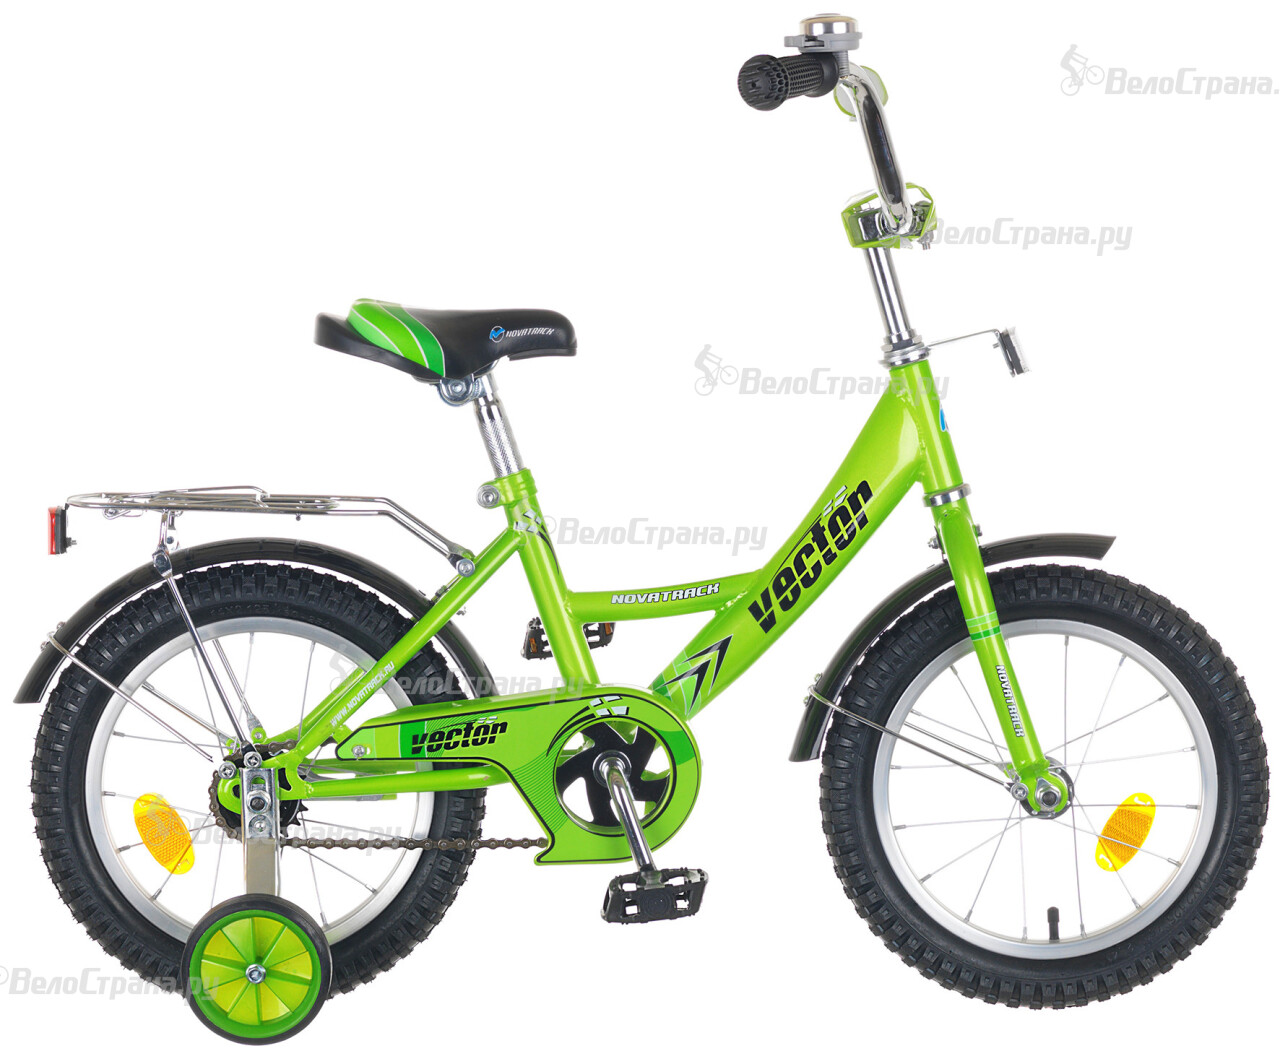 Велосипед Novatrack Vector 16 (2018) novatrack novatrack велосипед vector 16 зеленый